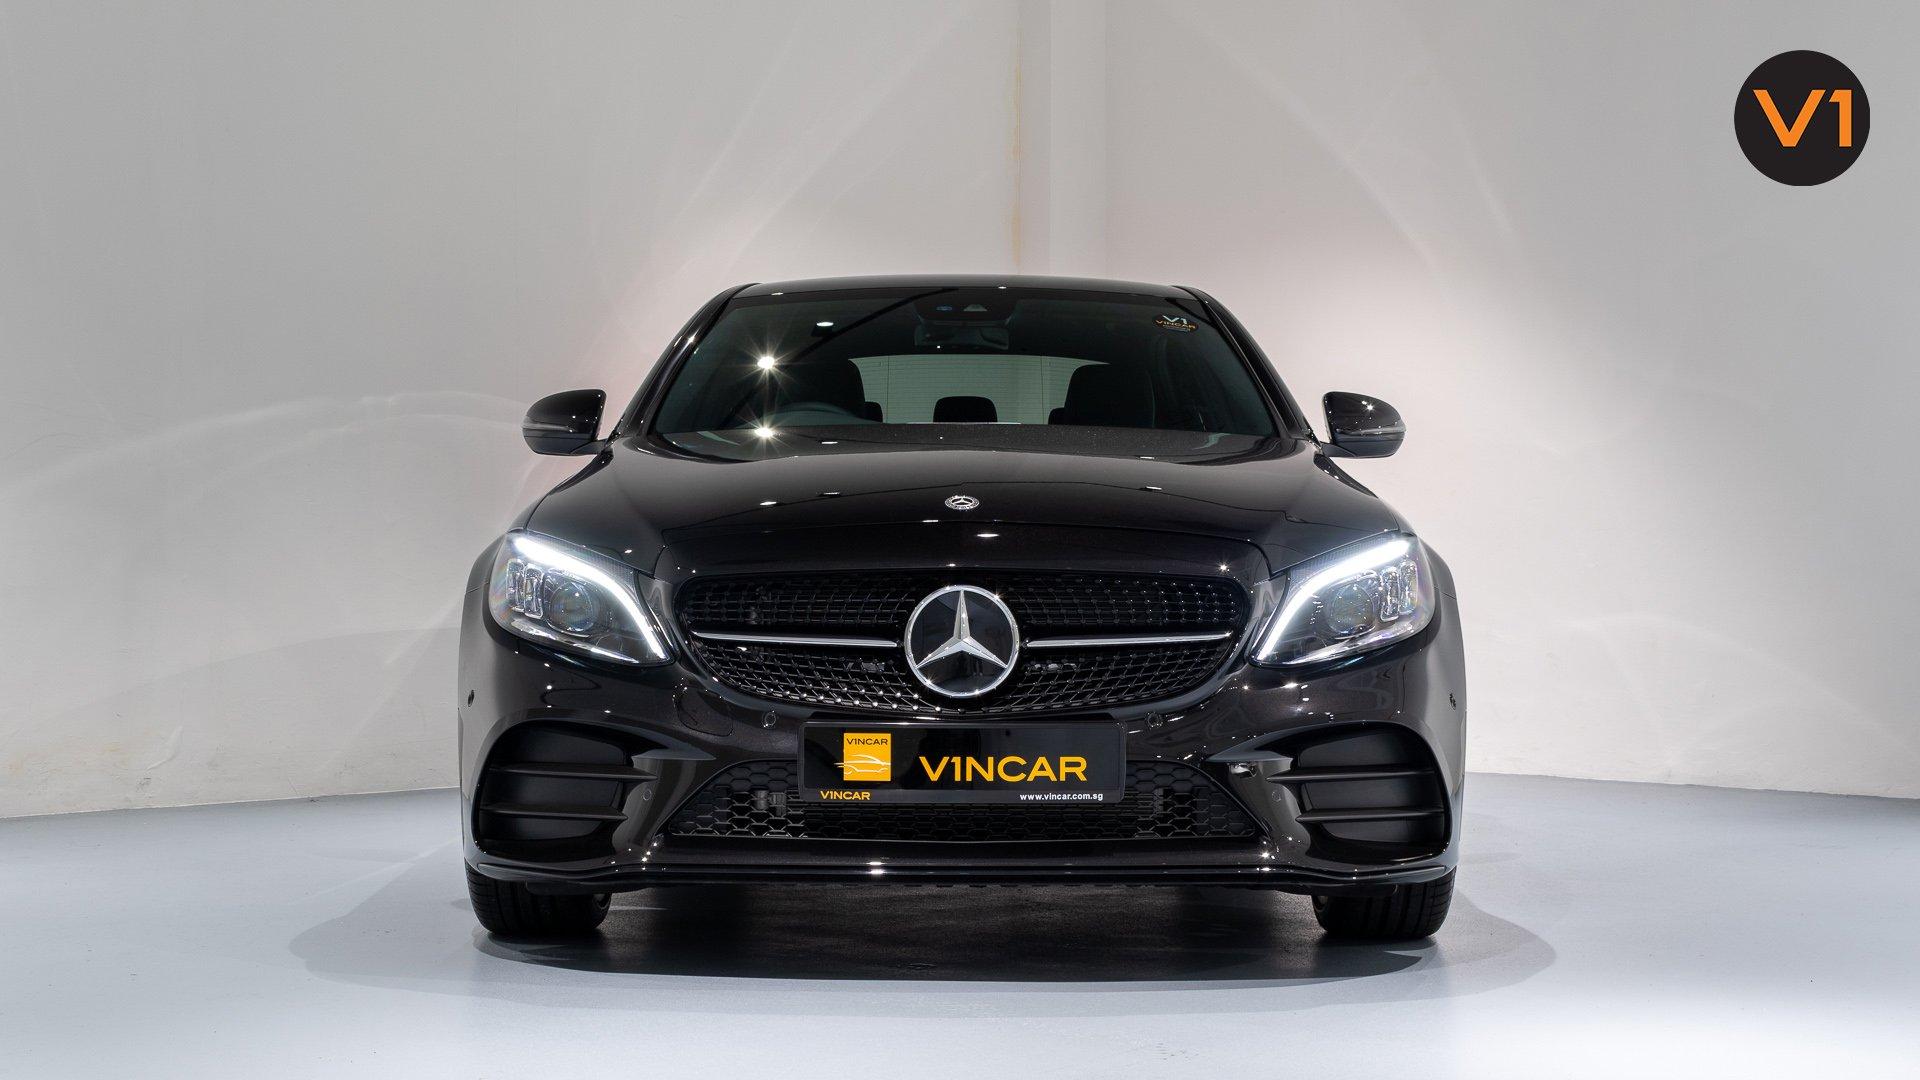 Mercedes-Benz C200 Saloon AMG Premium Night Edition - Front direct